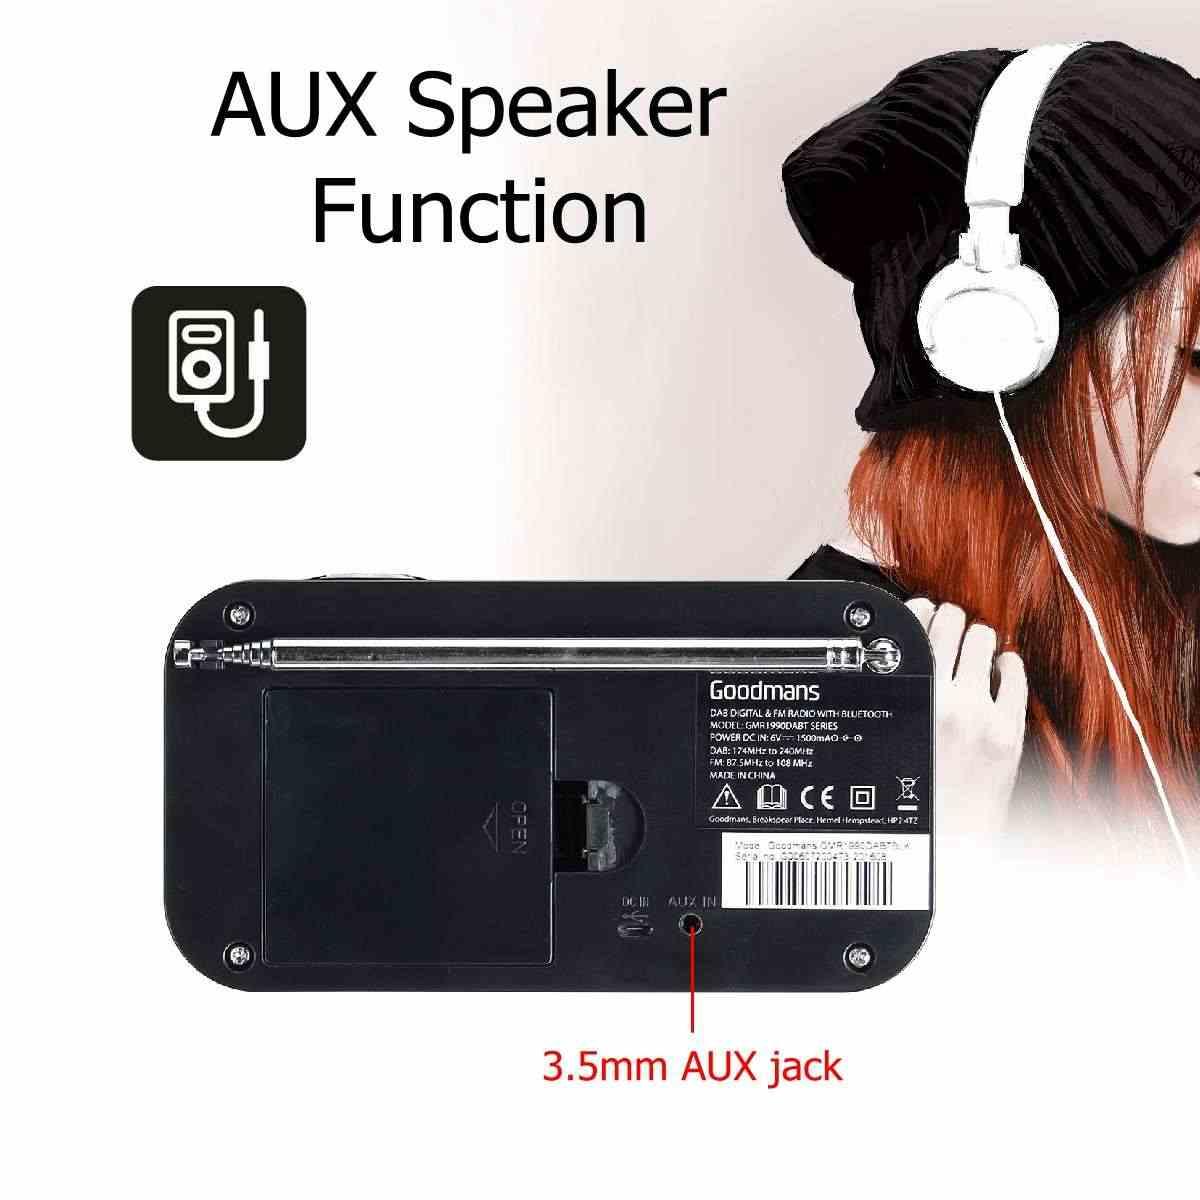 LEORY DAB Digitale FM Radio bluetooth Speaker 3.5mm AUX Jack Lcd-scherm Speaker in Zwart of Wit Kleur